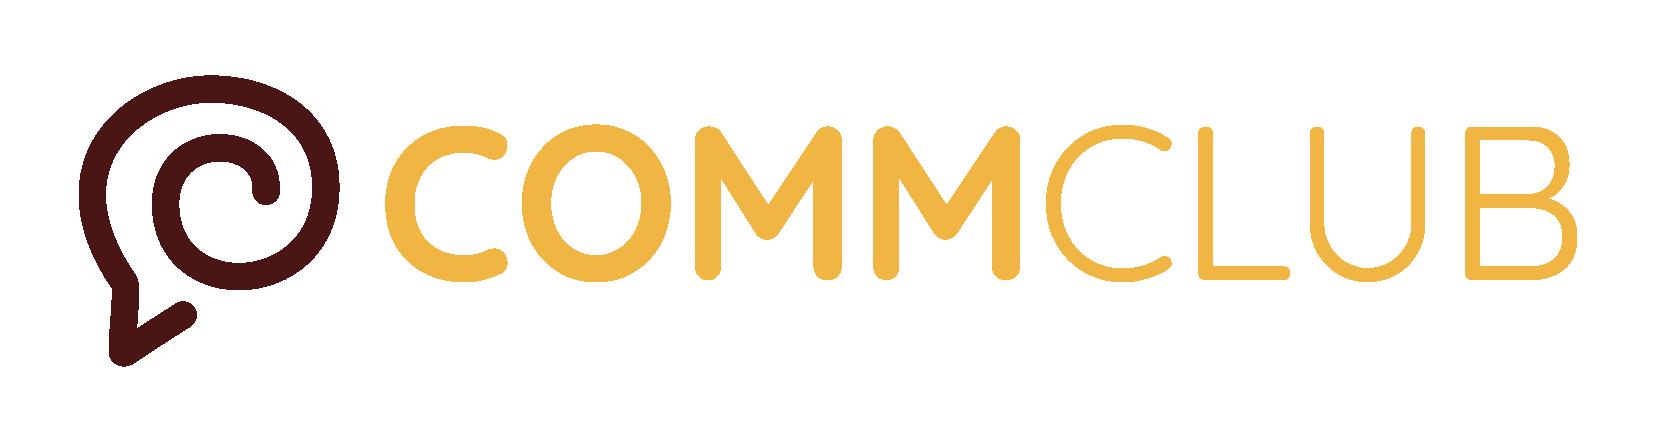 comm_club_logo